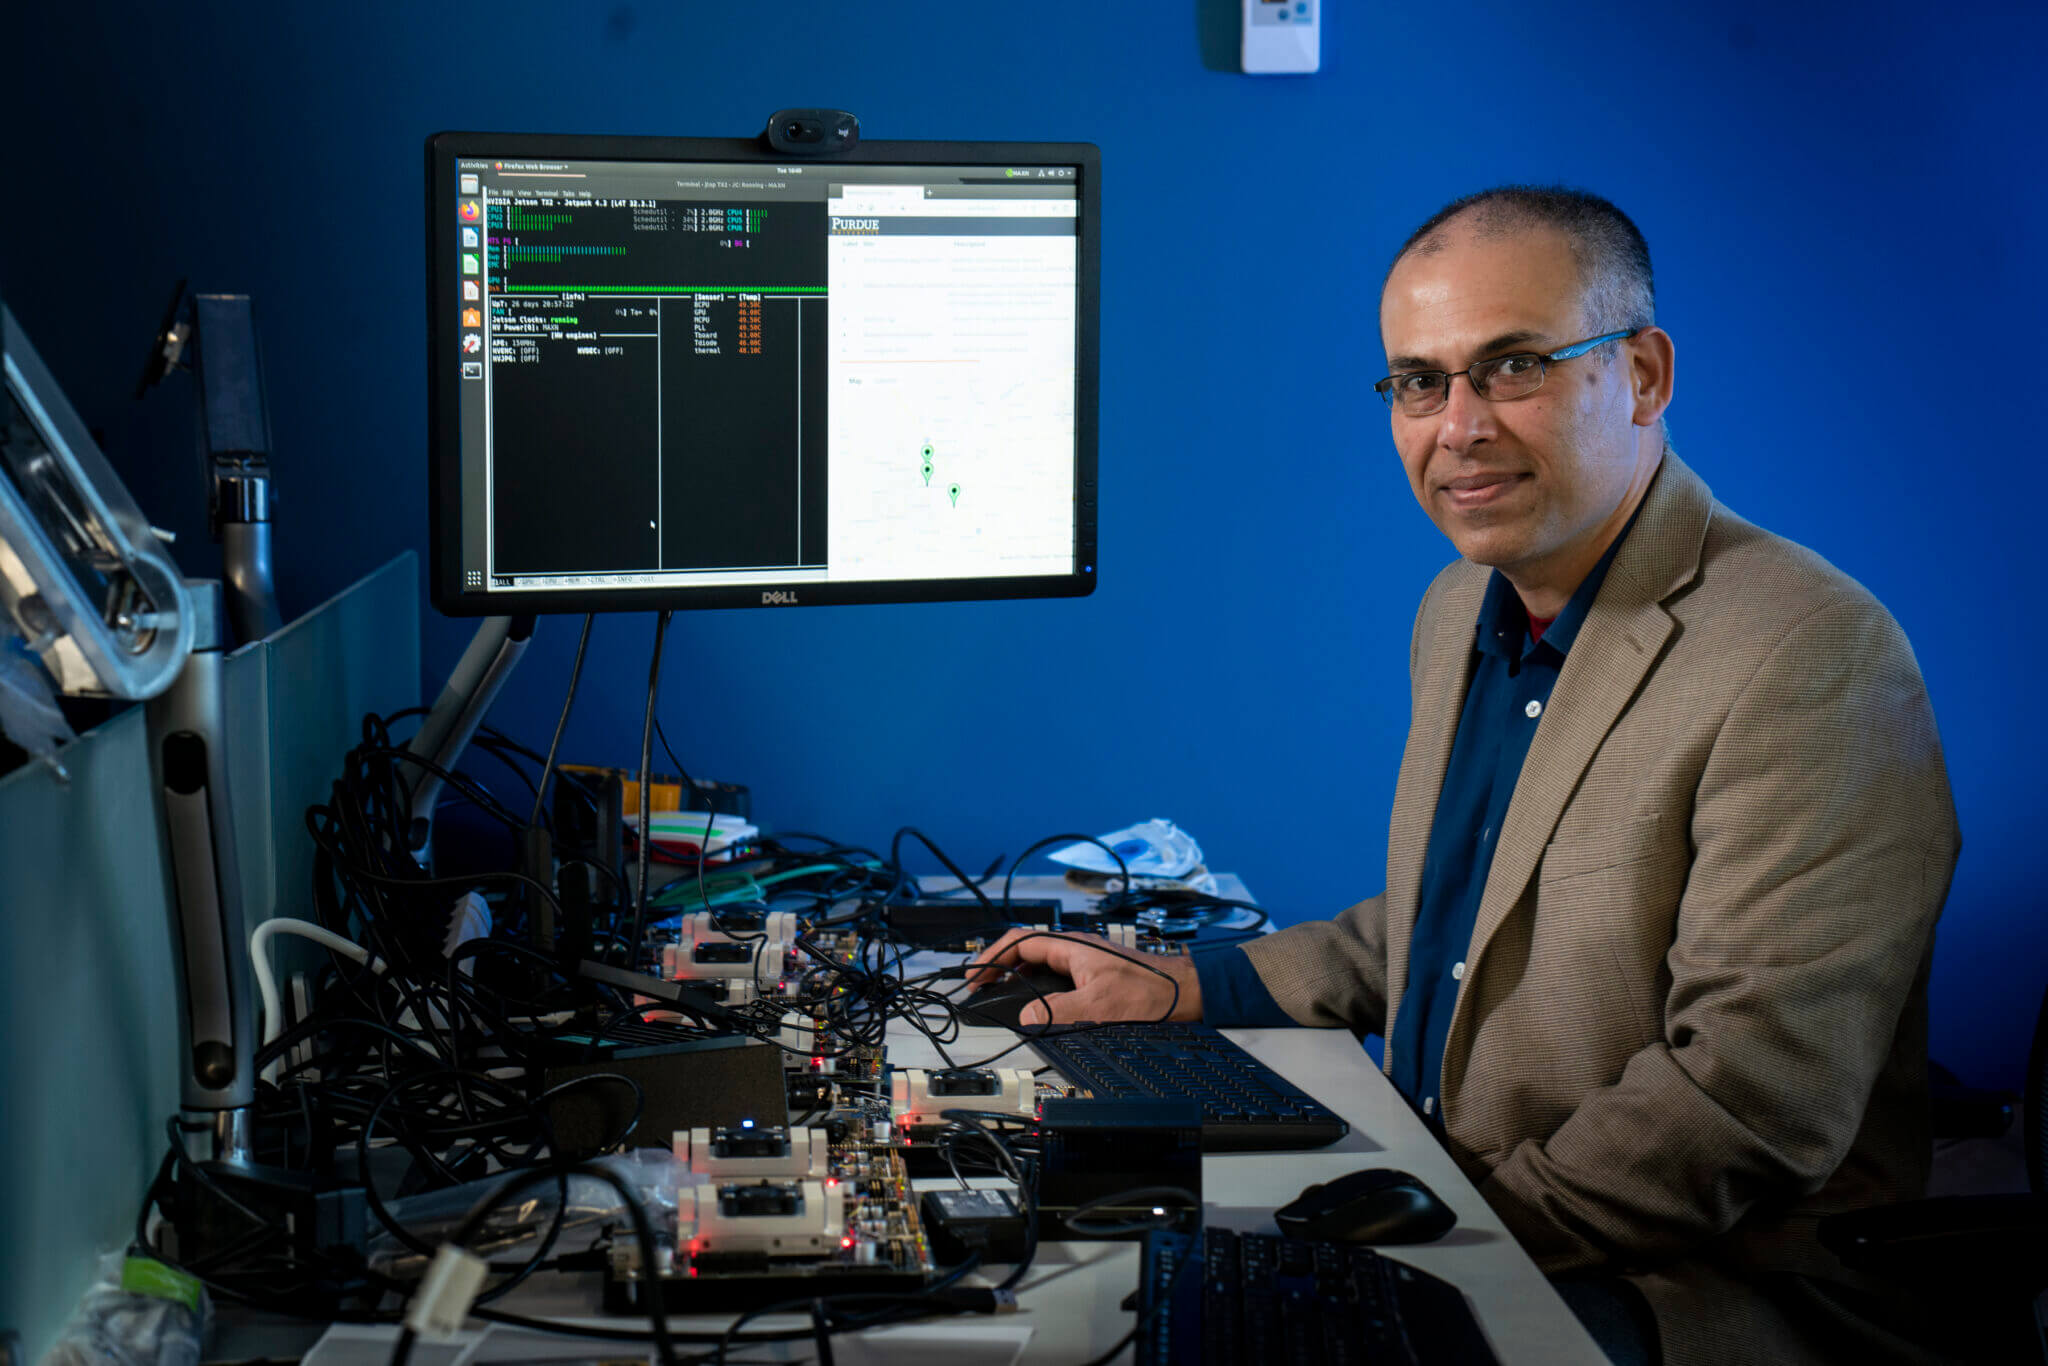 Saurabh Bagchi, Purdue University Electrical Engineering